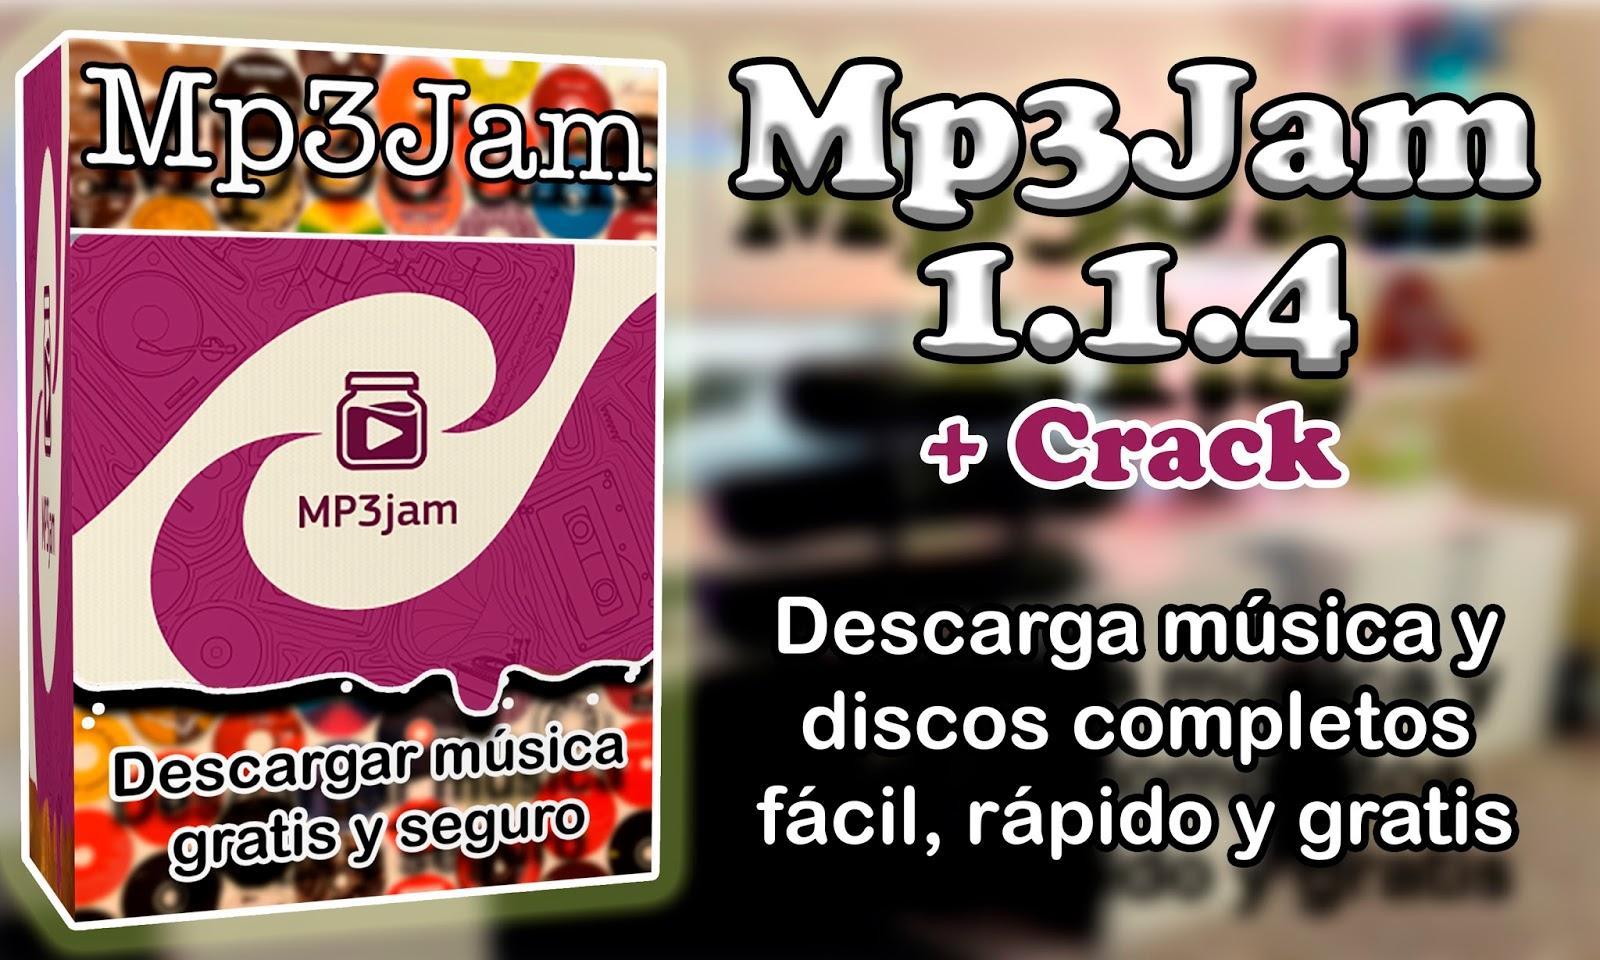 Mp3Jam | Programas y Utilidades PC